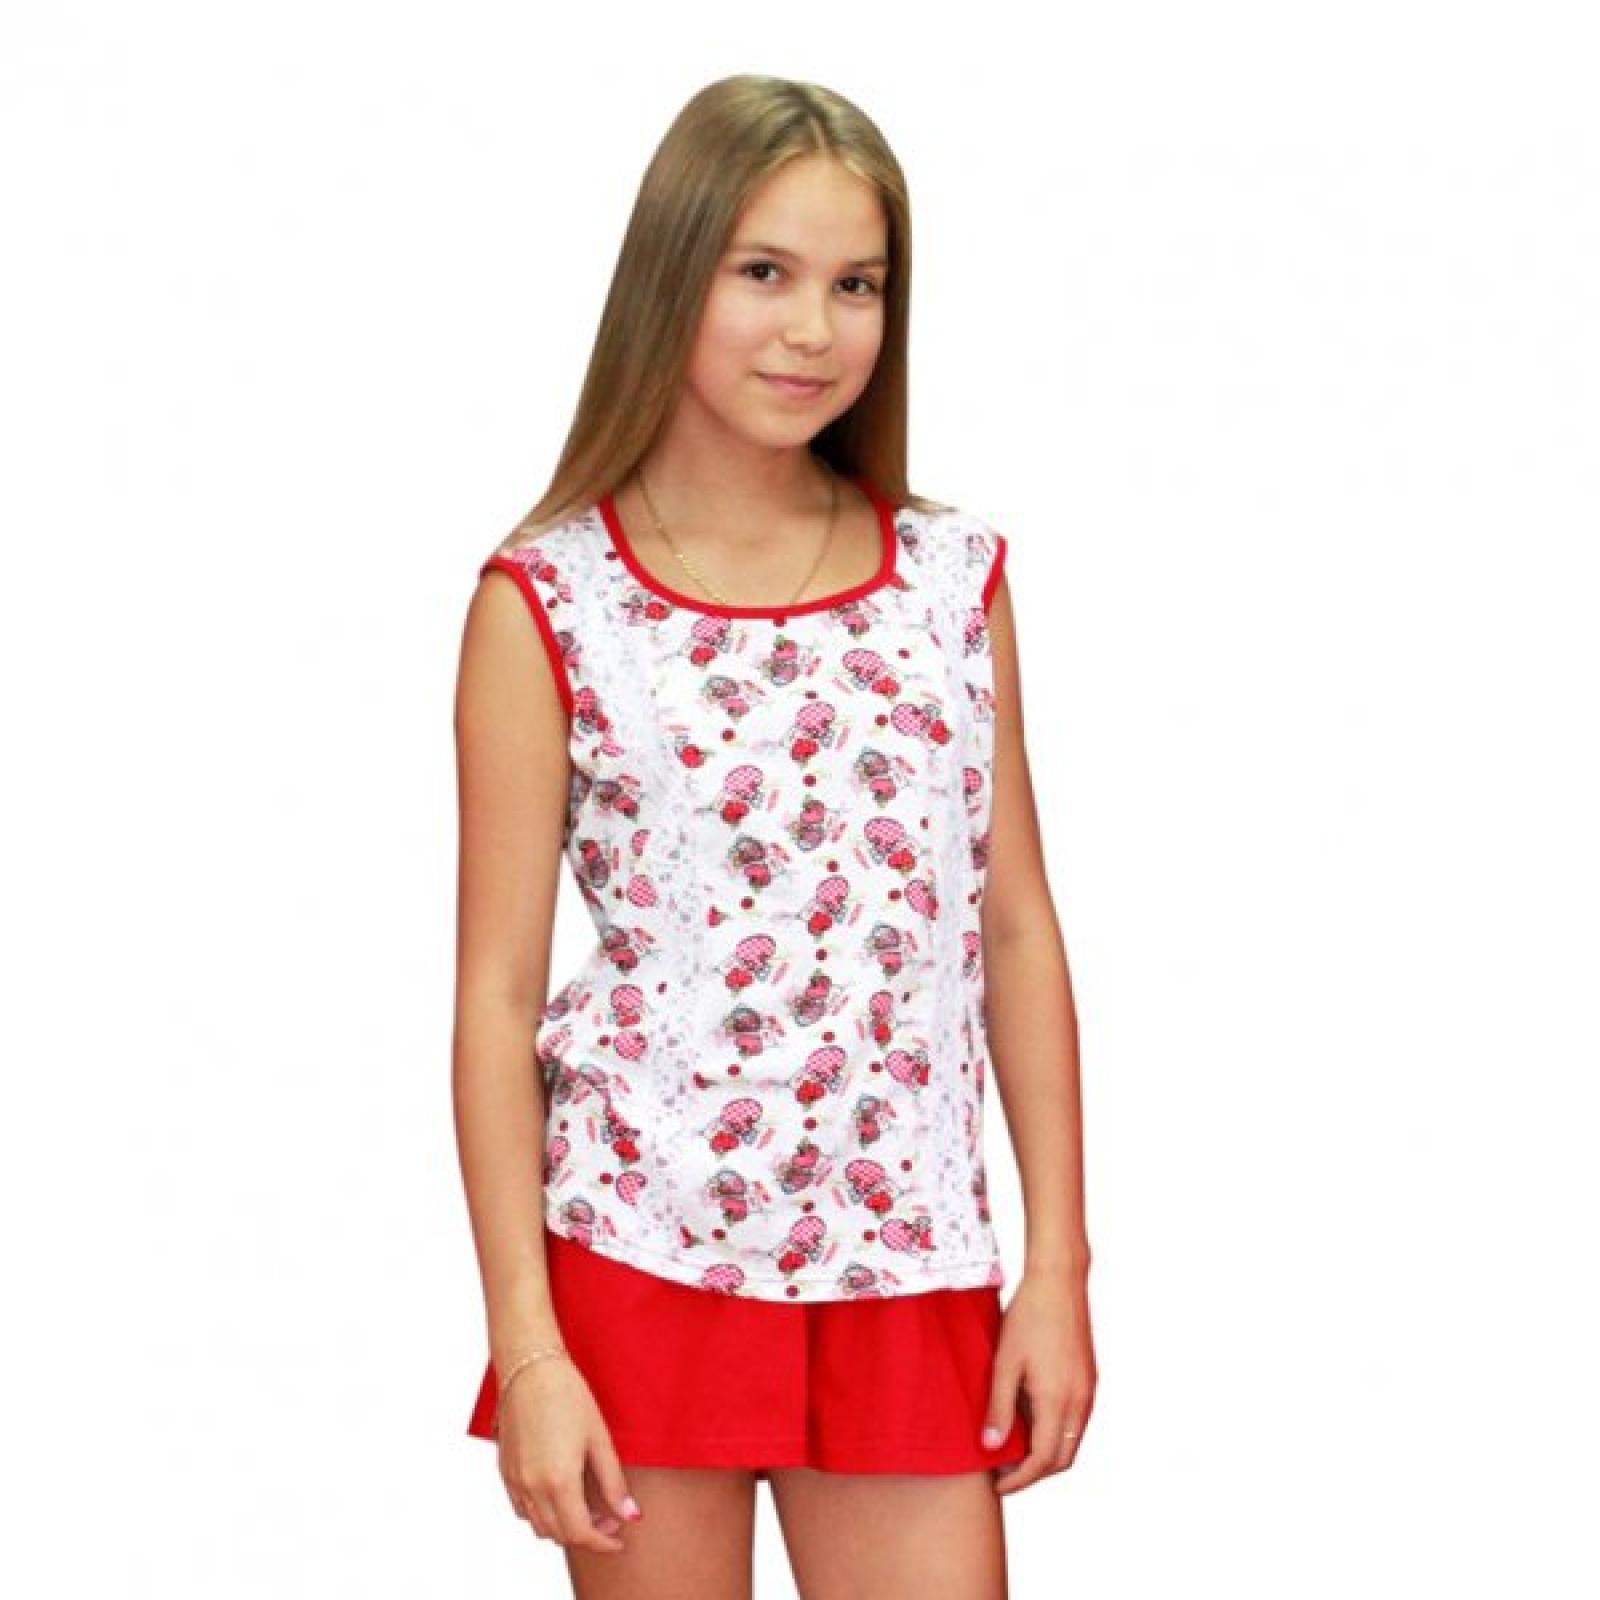 Пижама Love(майка+шорты, гипюр) М-0029